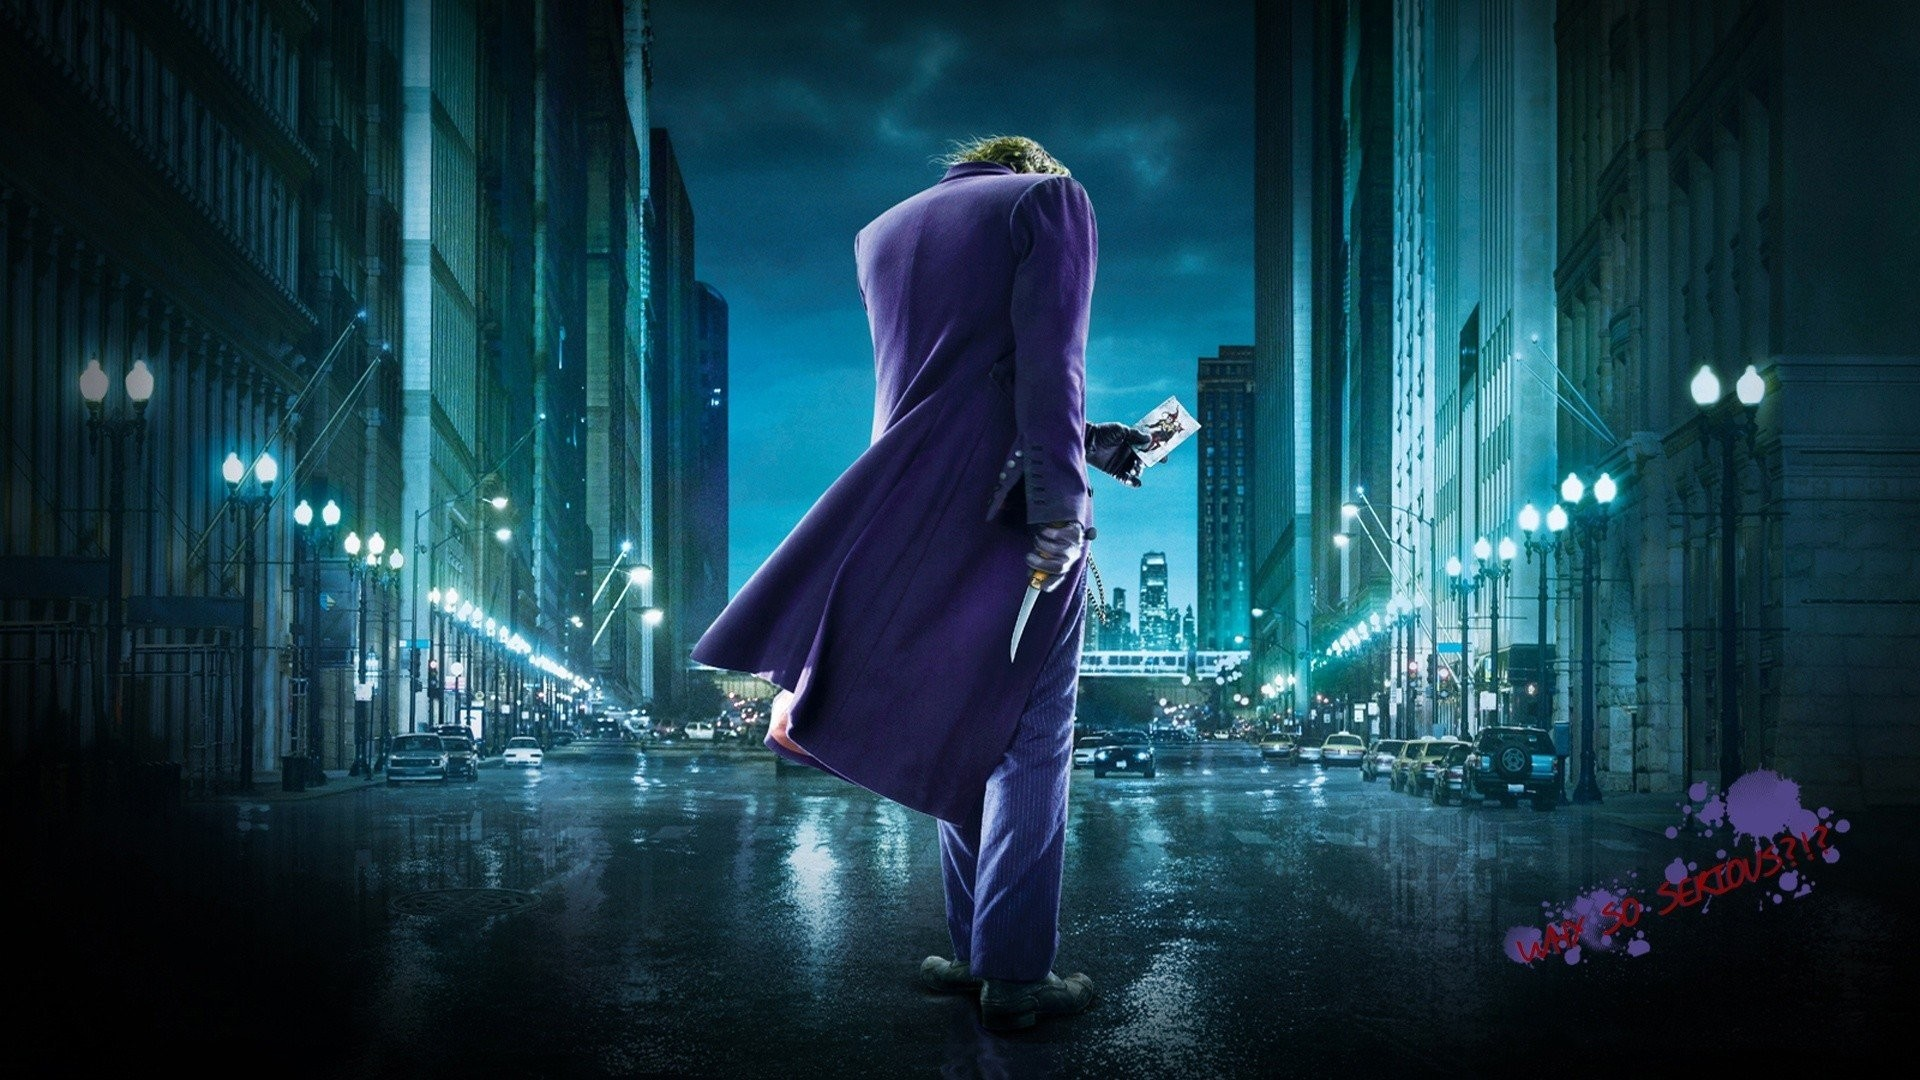 Batman The Dark Knight Heath Ledger Movies Joker 99770 …